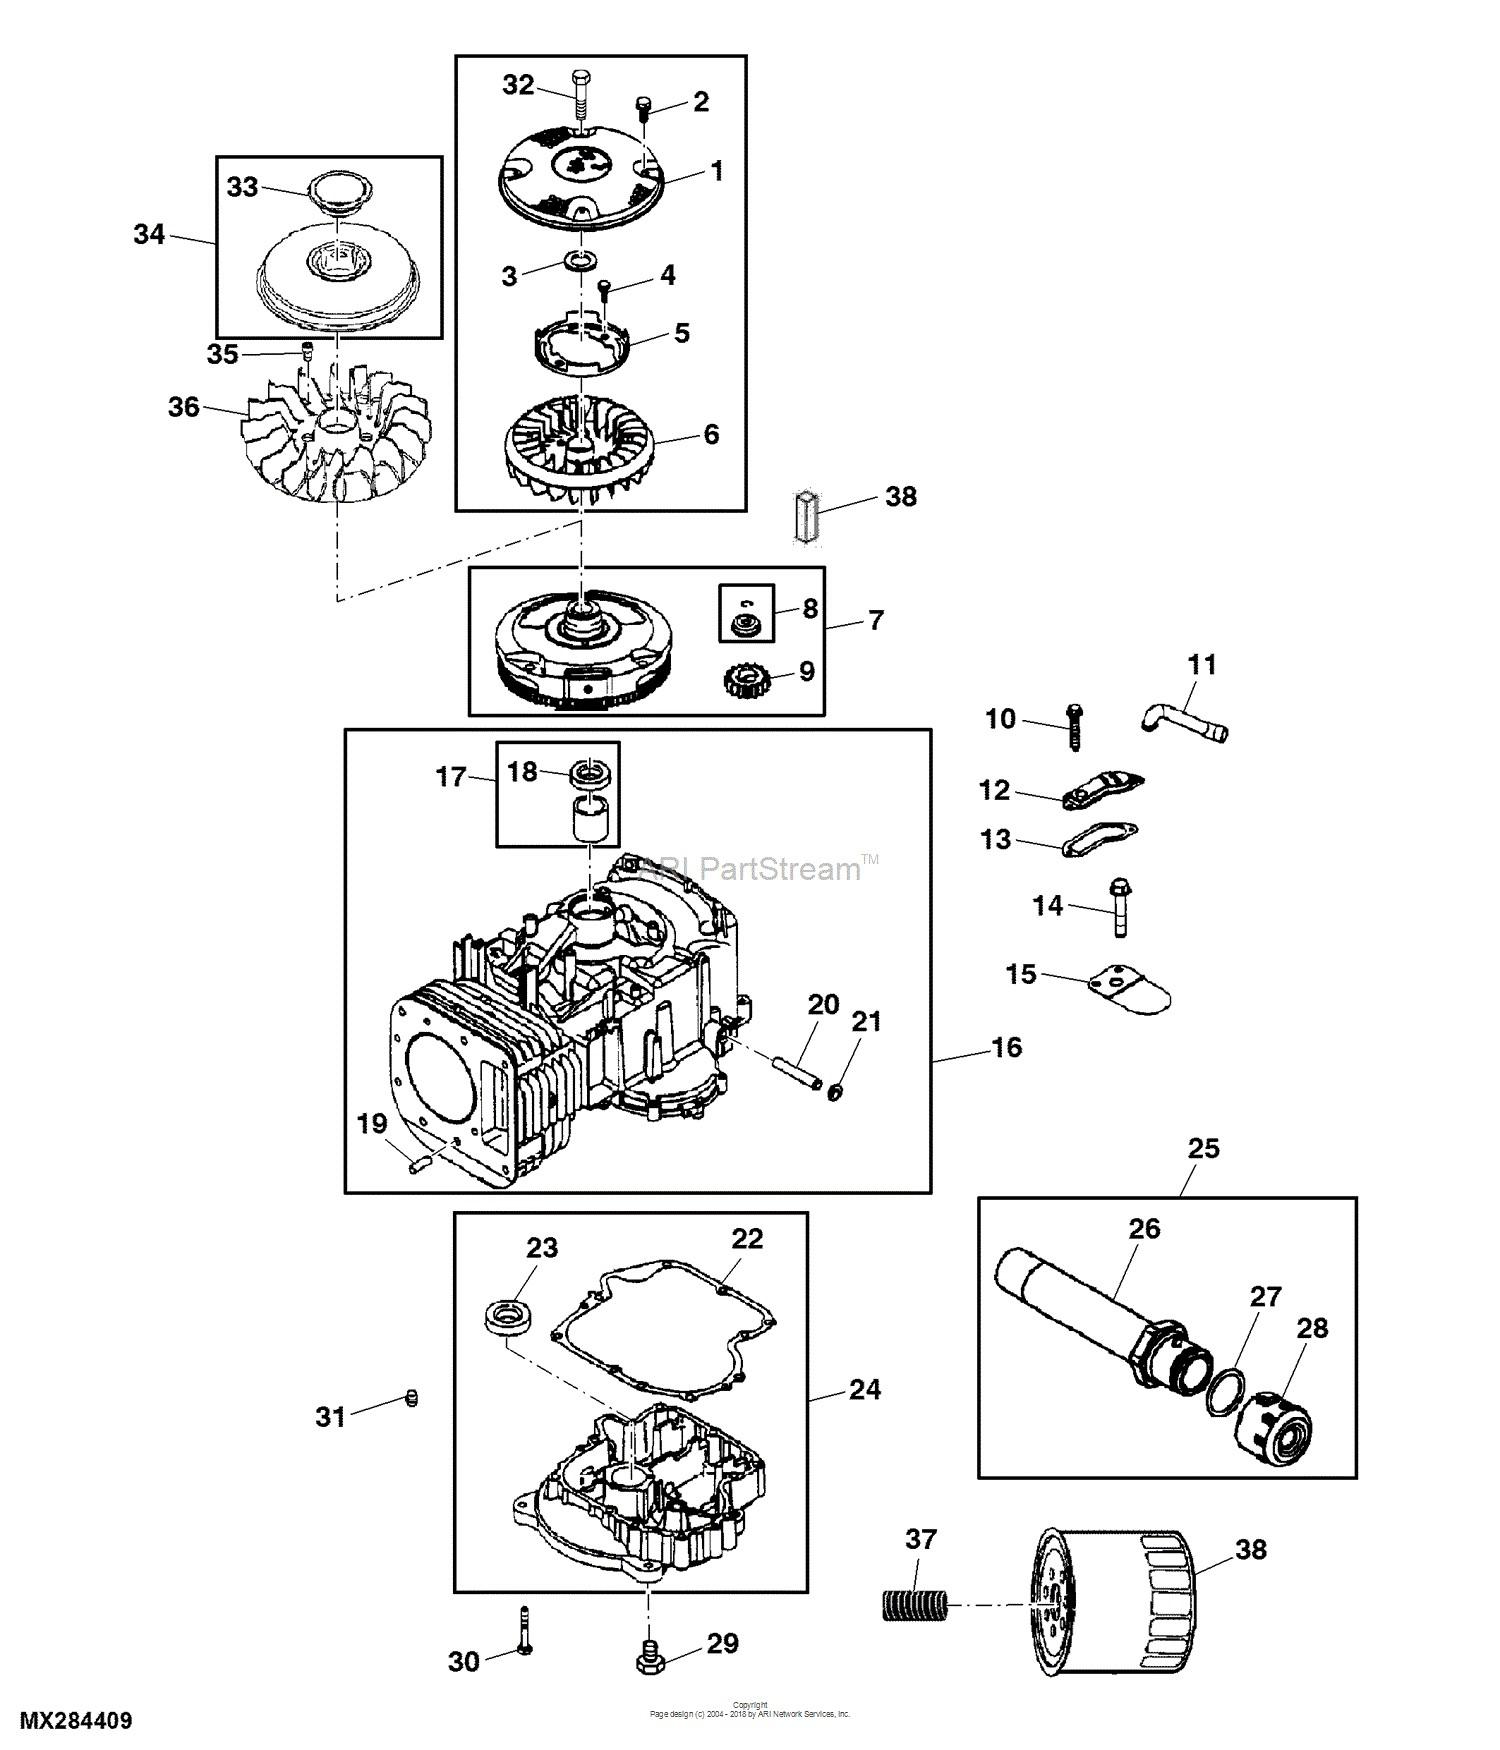 Tractor Engine Diagram John Deere Parts Diagrams John Deere L100 Lawn Tractor with 42 In Of Tractor Engine Diagram